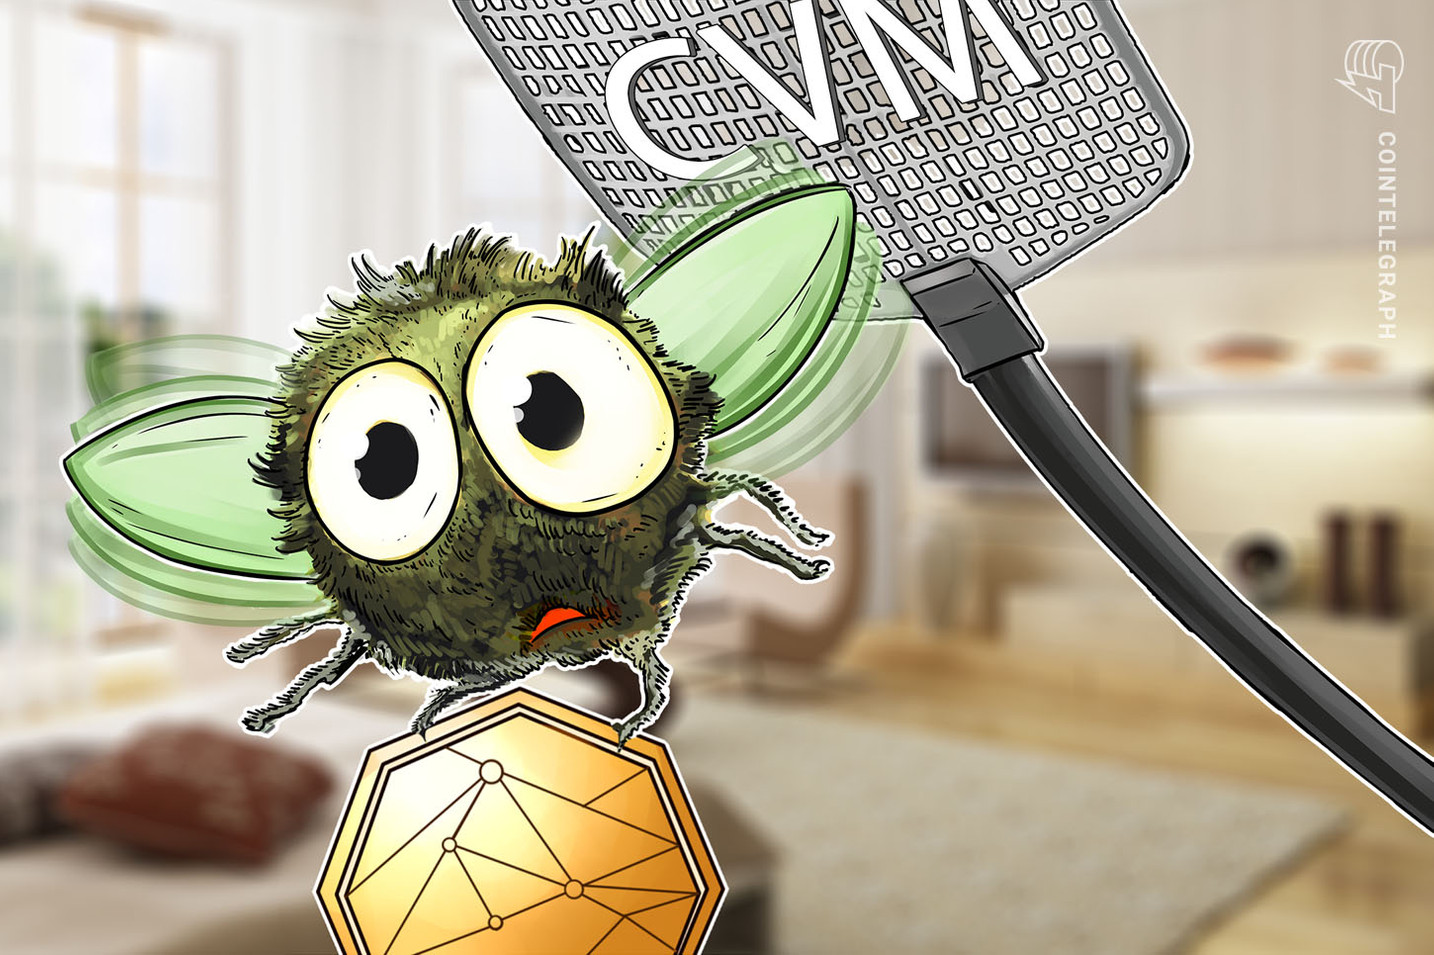 Unick Forex, Investimento Bitcoin, Minerworld; CVM dá dicas para evitar pirâmides financeiras